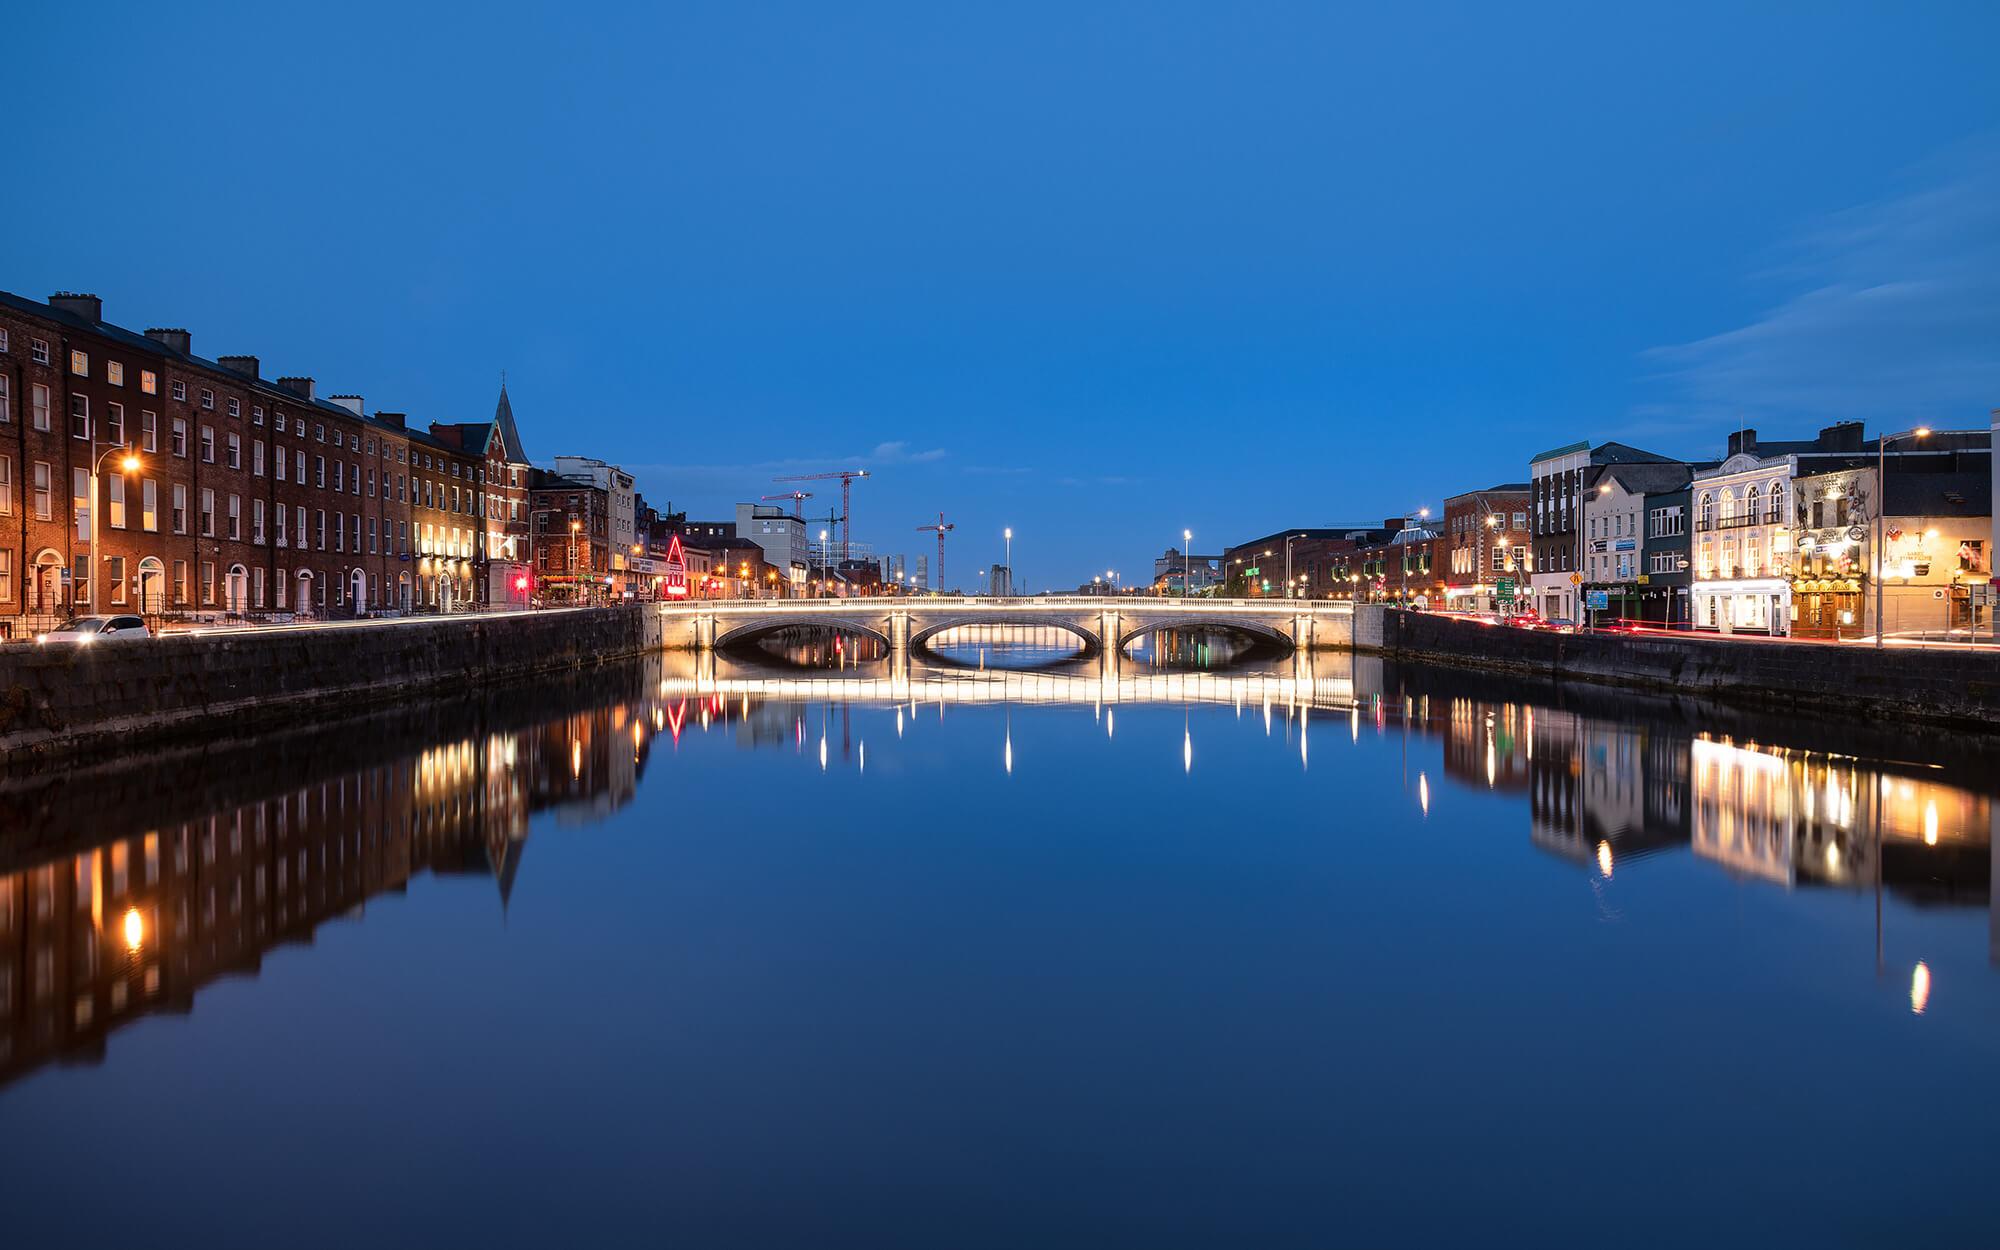 St. Patrick's Bridge Wins Judges Choice Awards